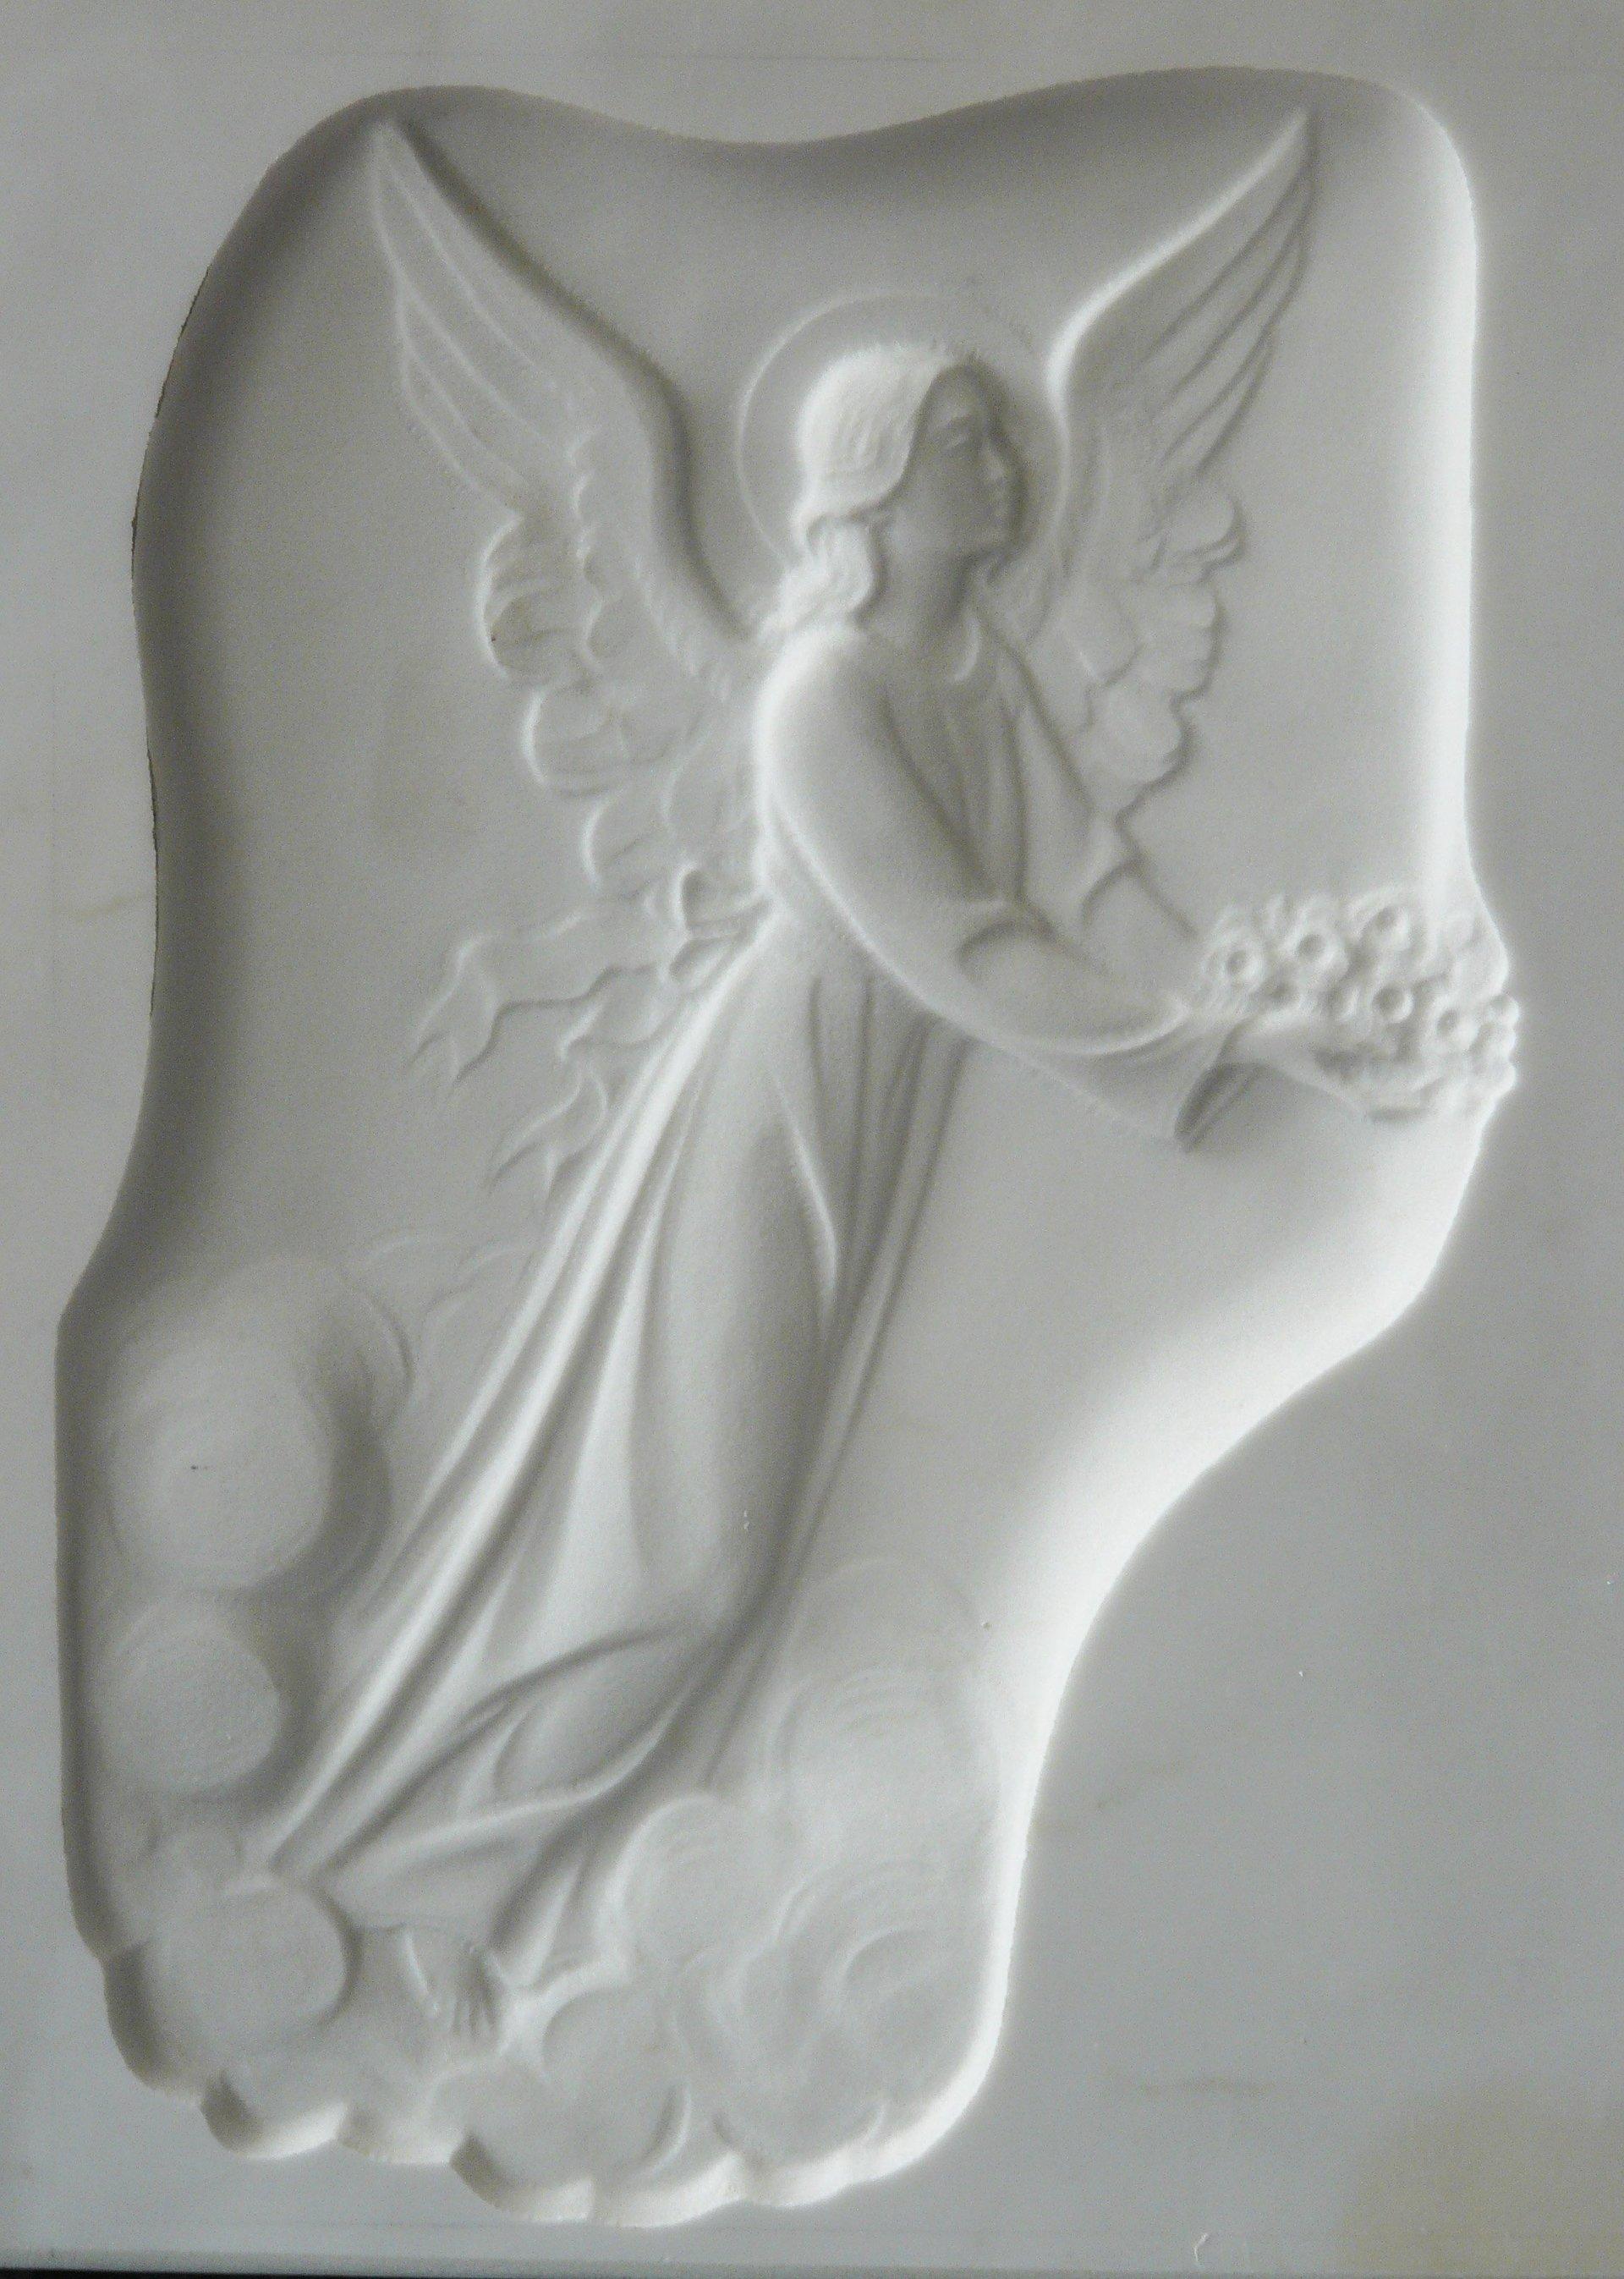 bassorilievo su marmo bianco rappresentante una angelo